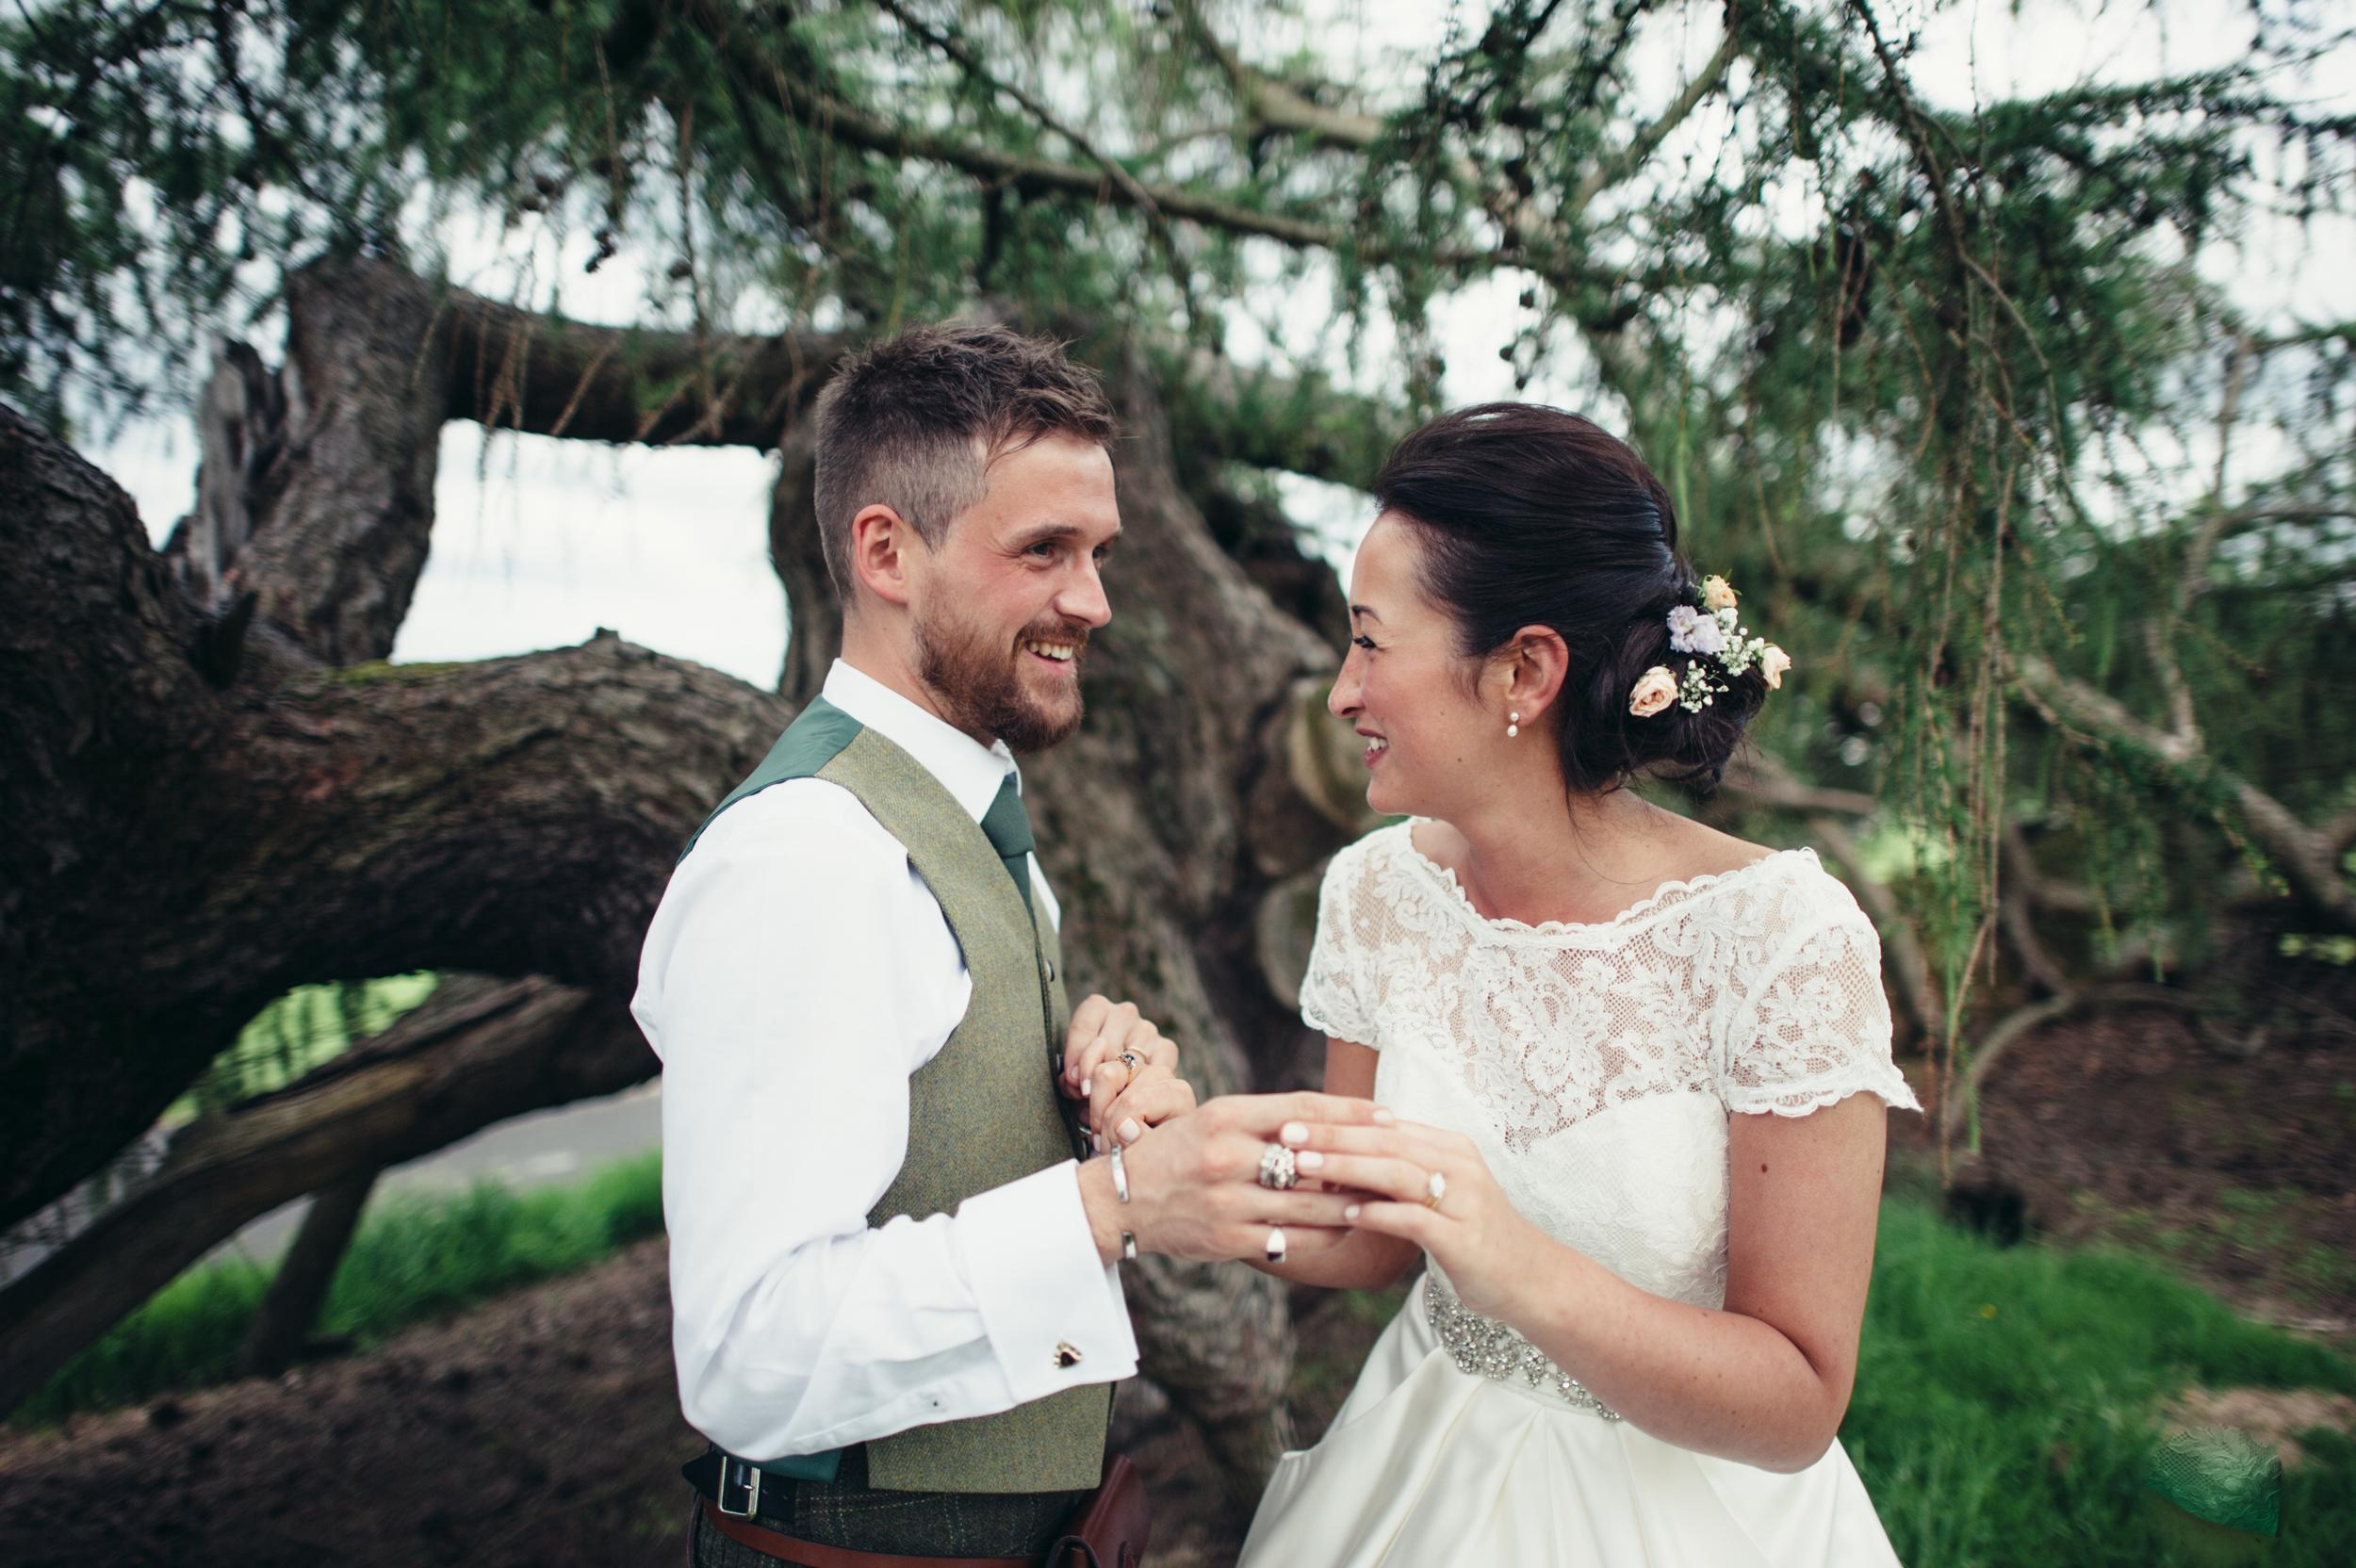 0173-lisa-devine-alternative-creative-wedding-photography-glasgow-edinburgh.JPG